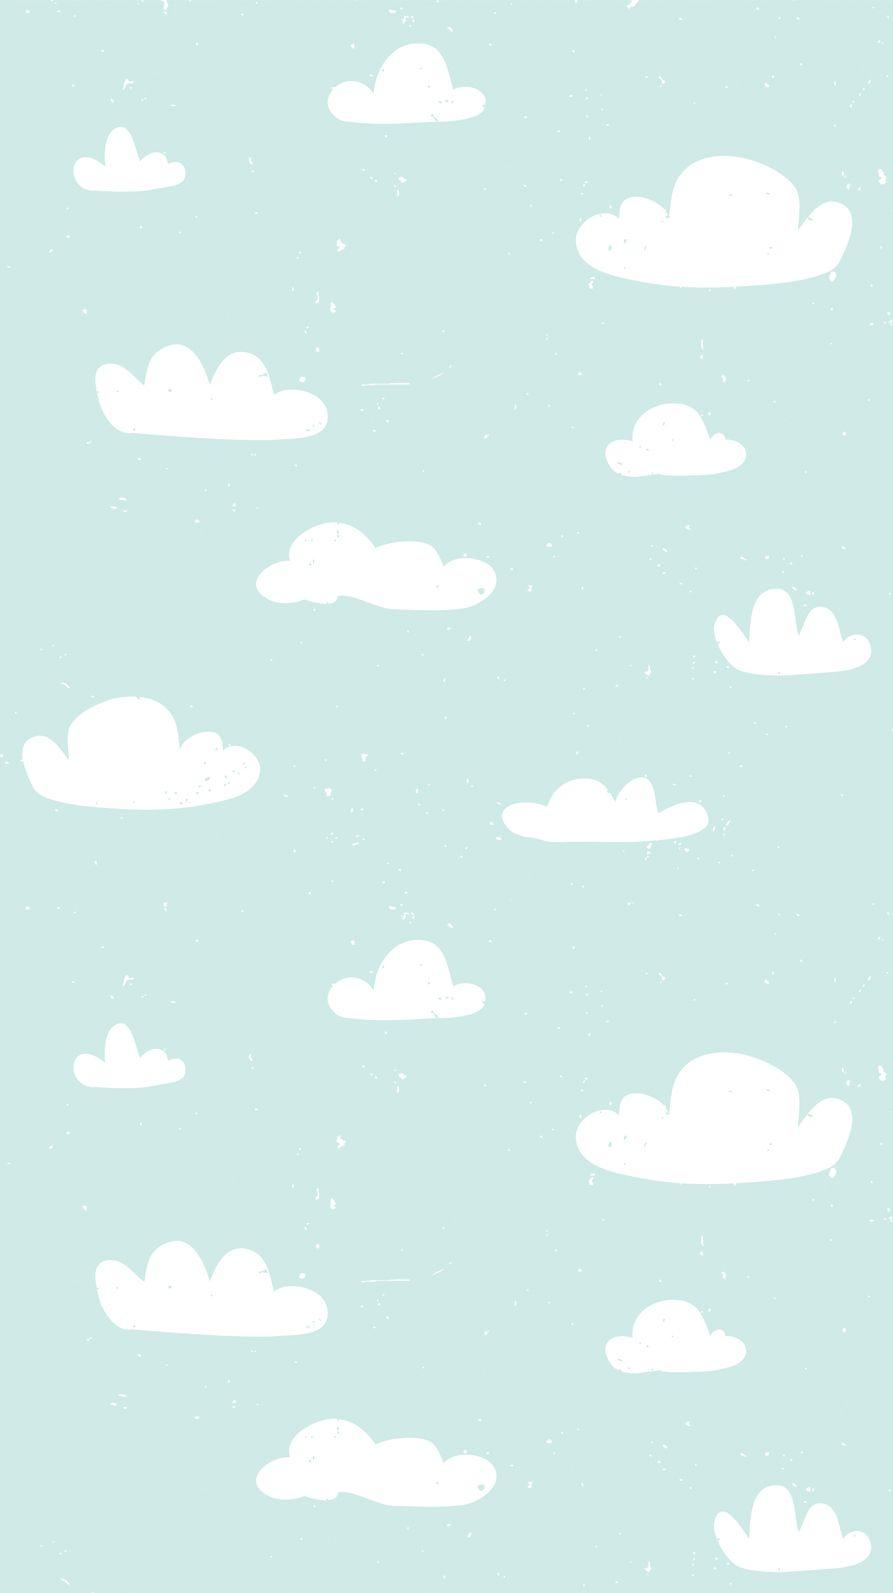 Love Blue Sky iPhone Wallpaper Home Screen @PanPins | Iphone homescreen wallpaper, Iphone ...